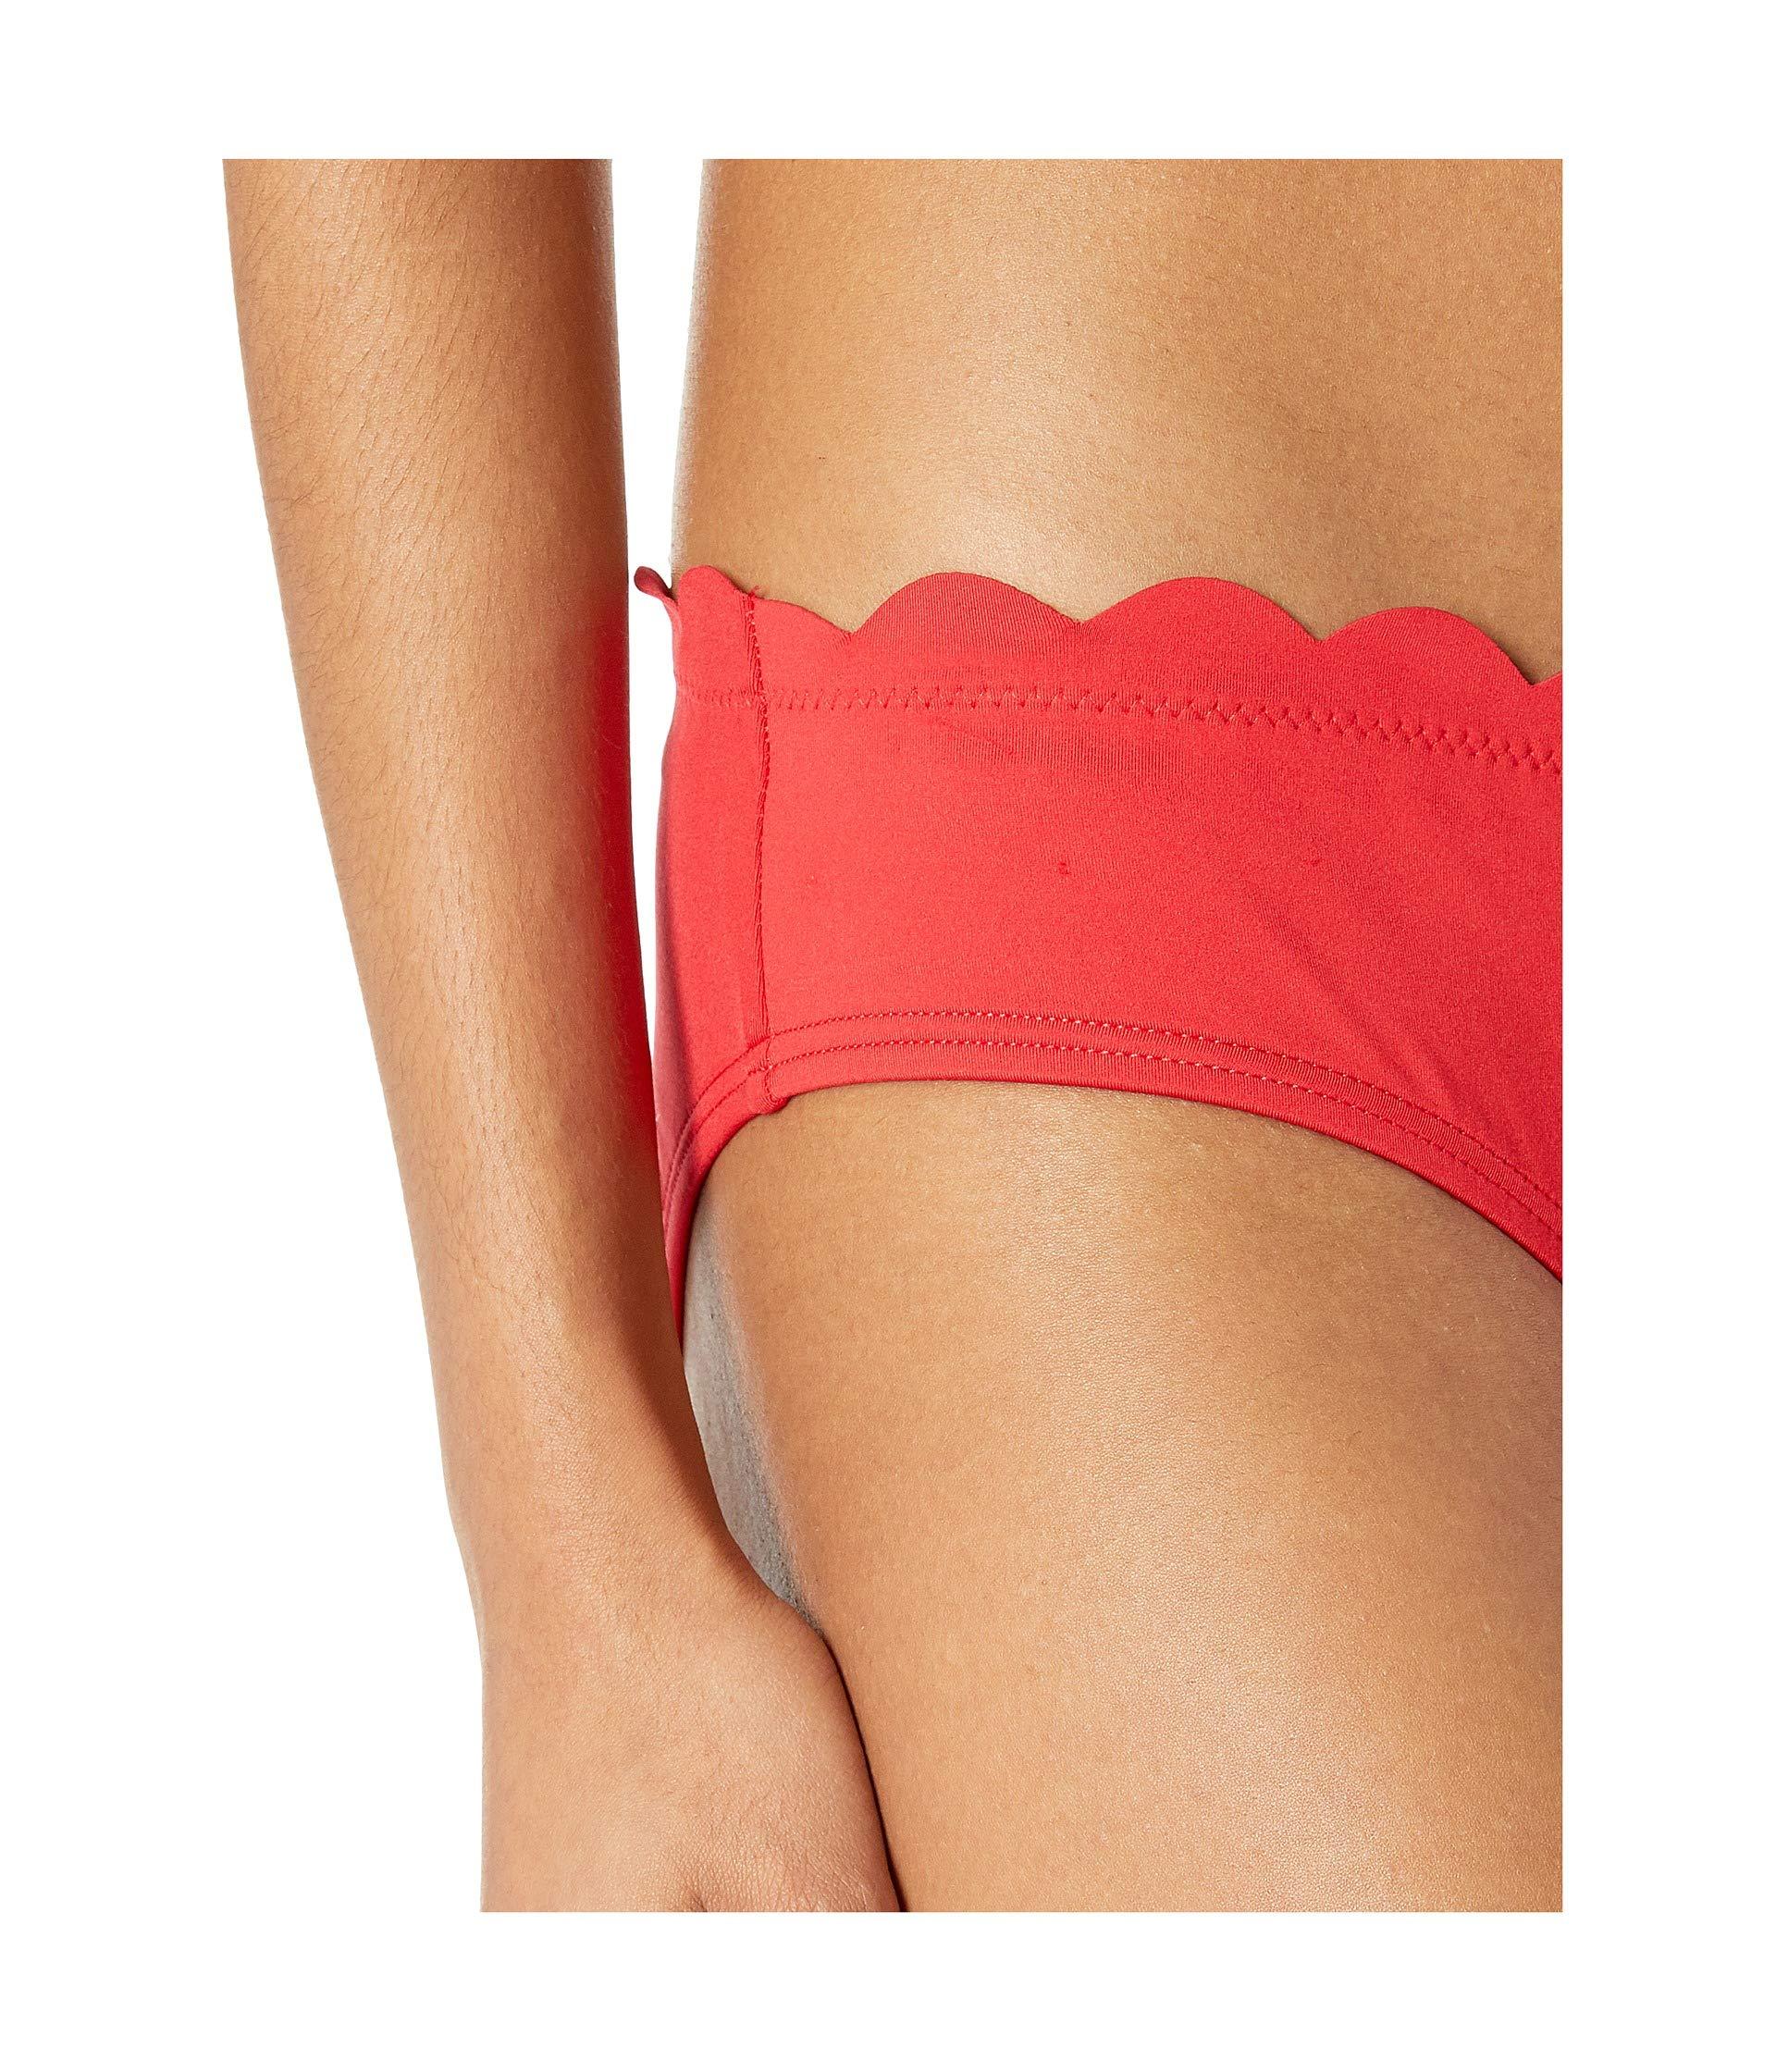 Soft Cups Kate York Rosa Triangle Red Removable Core Solids Bikini Top Spade Scalloped W 79 New BBHp7O